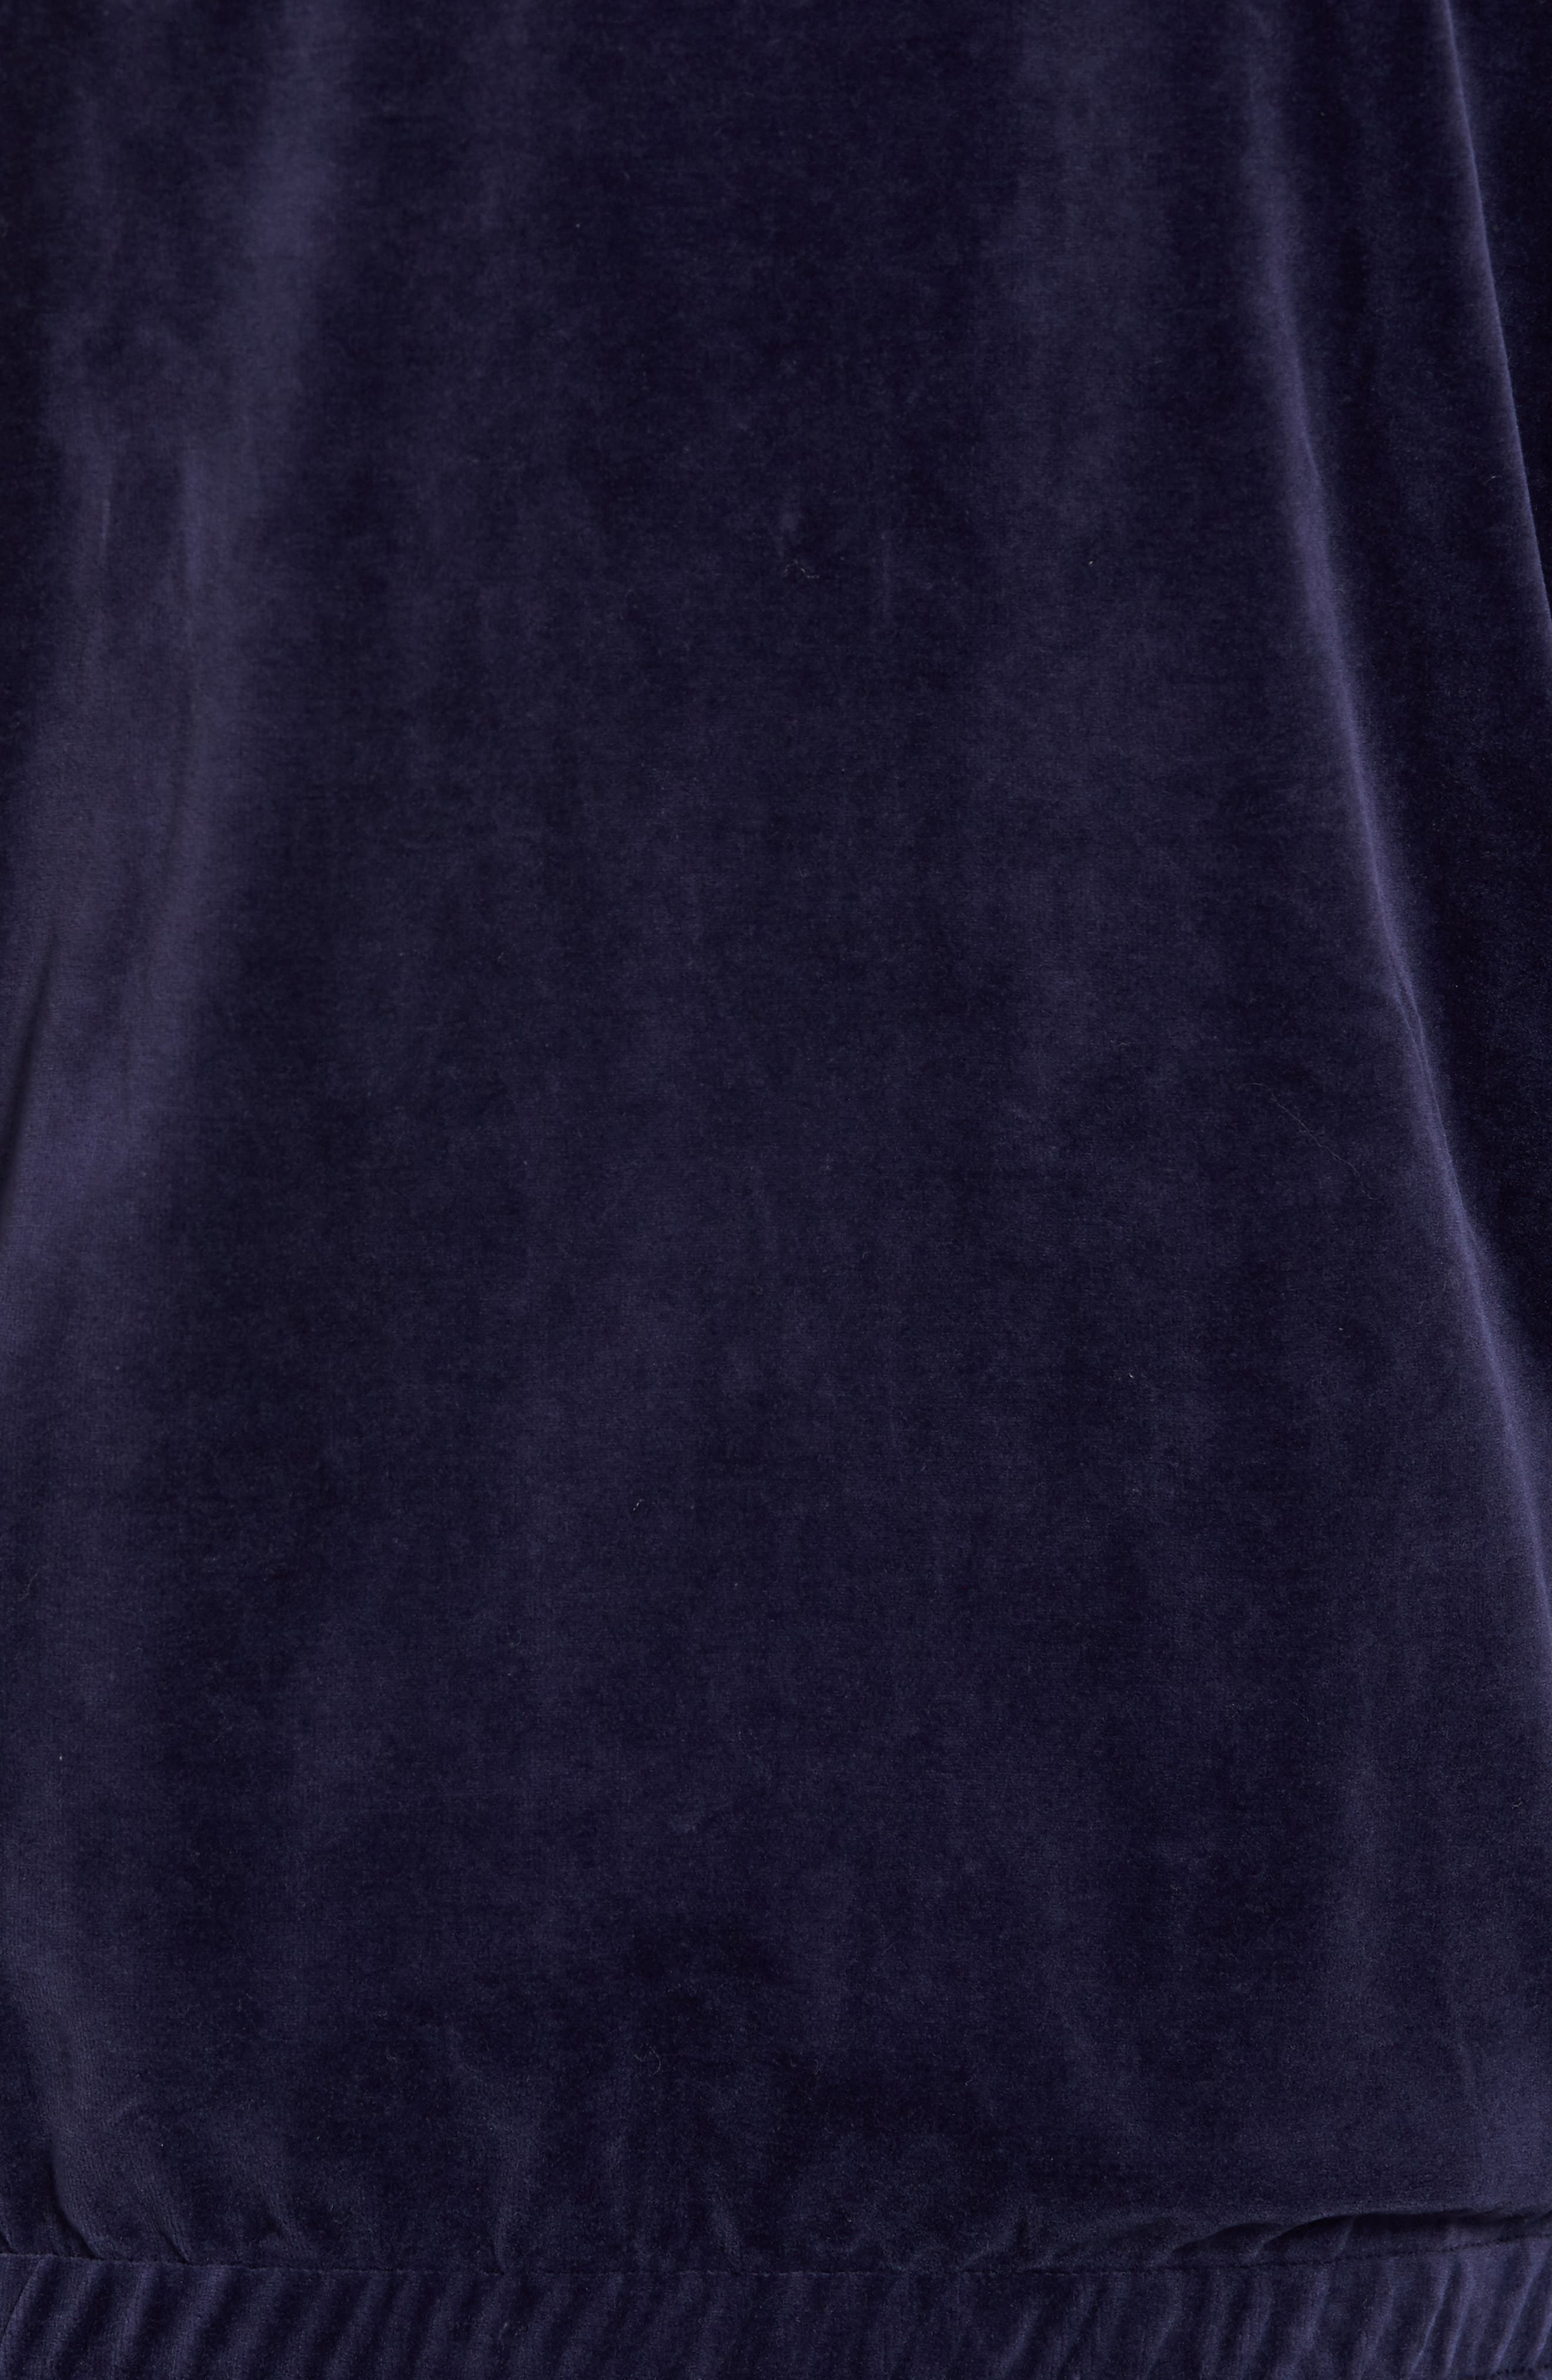 Velour Jacket,                             Alternate thumbnail 15, color,